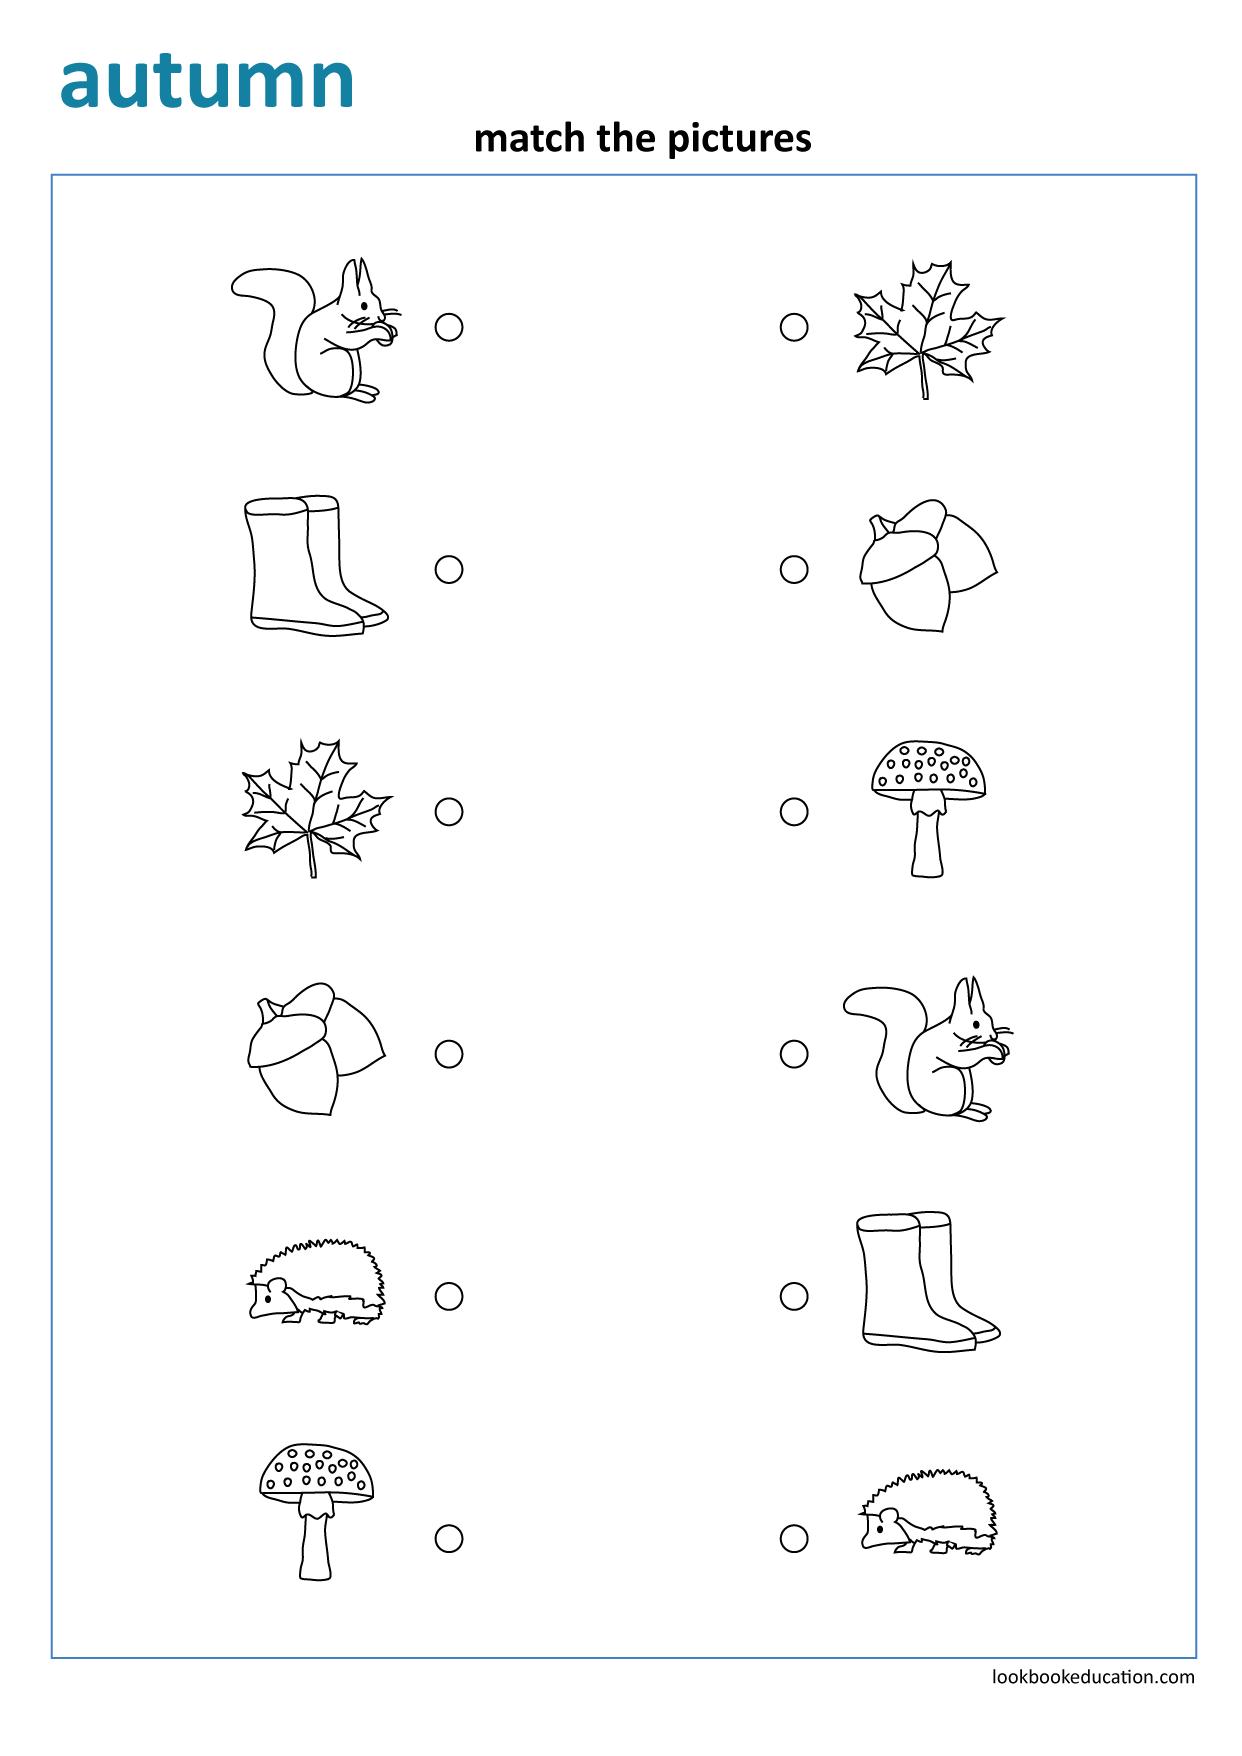 Worksheet Matching Autumn